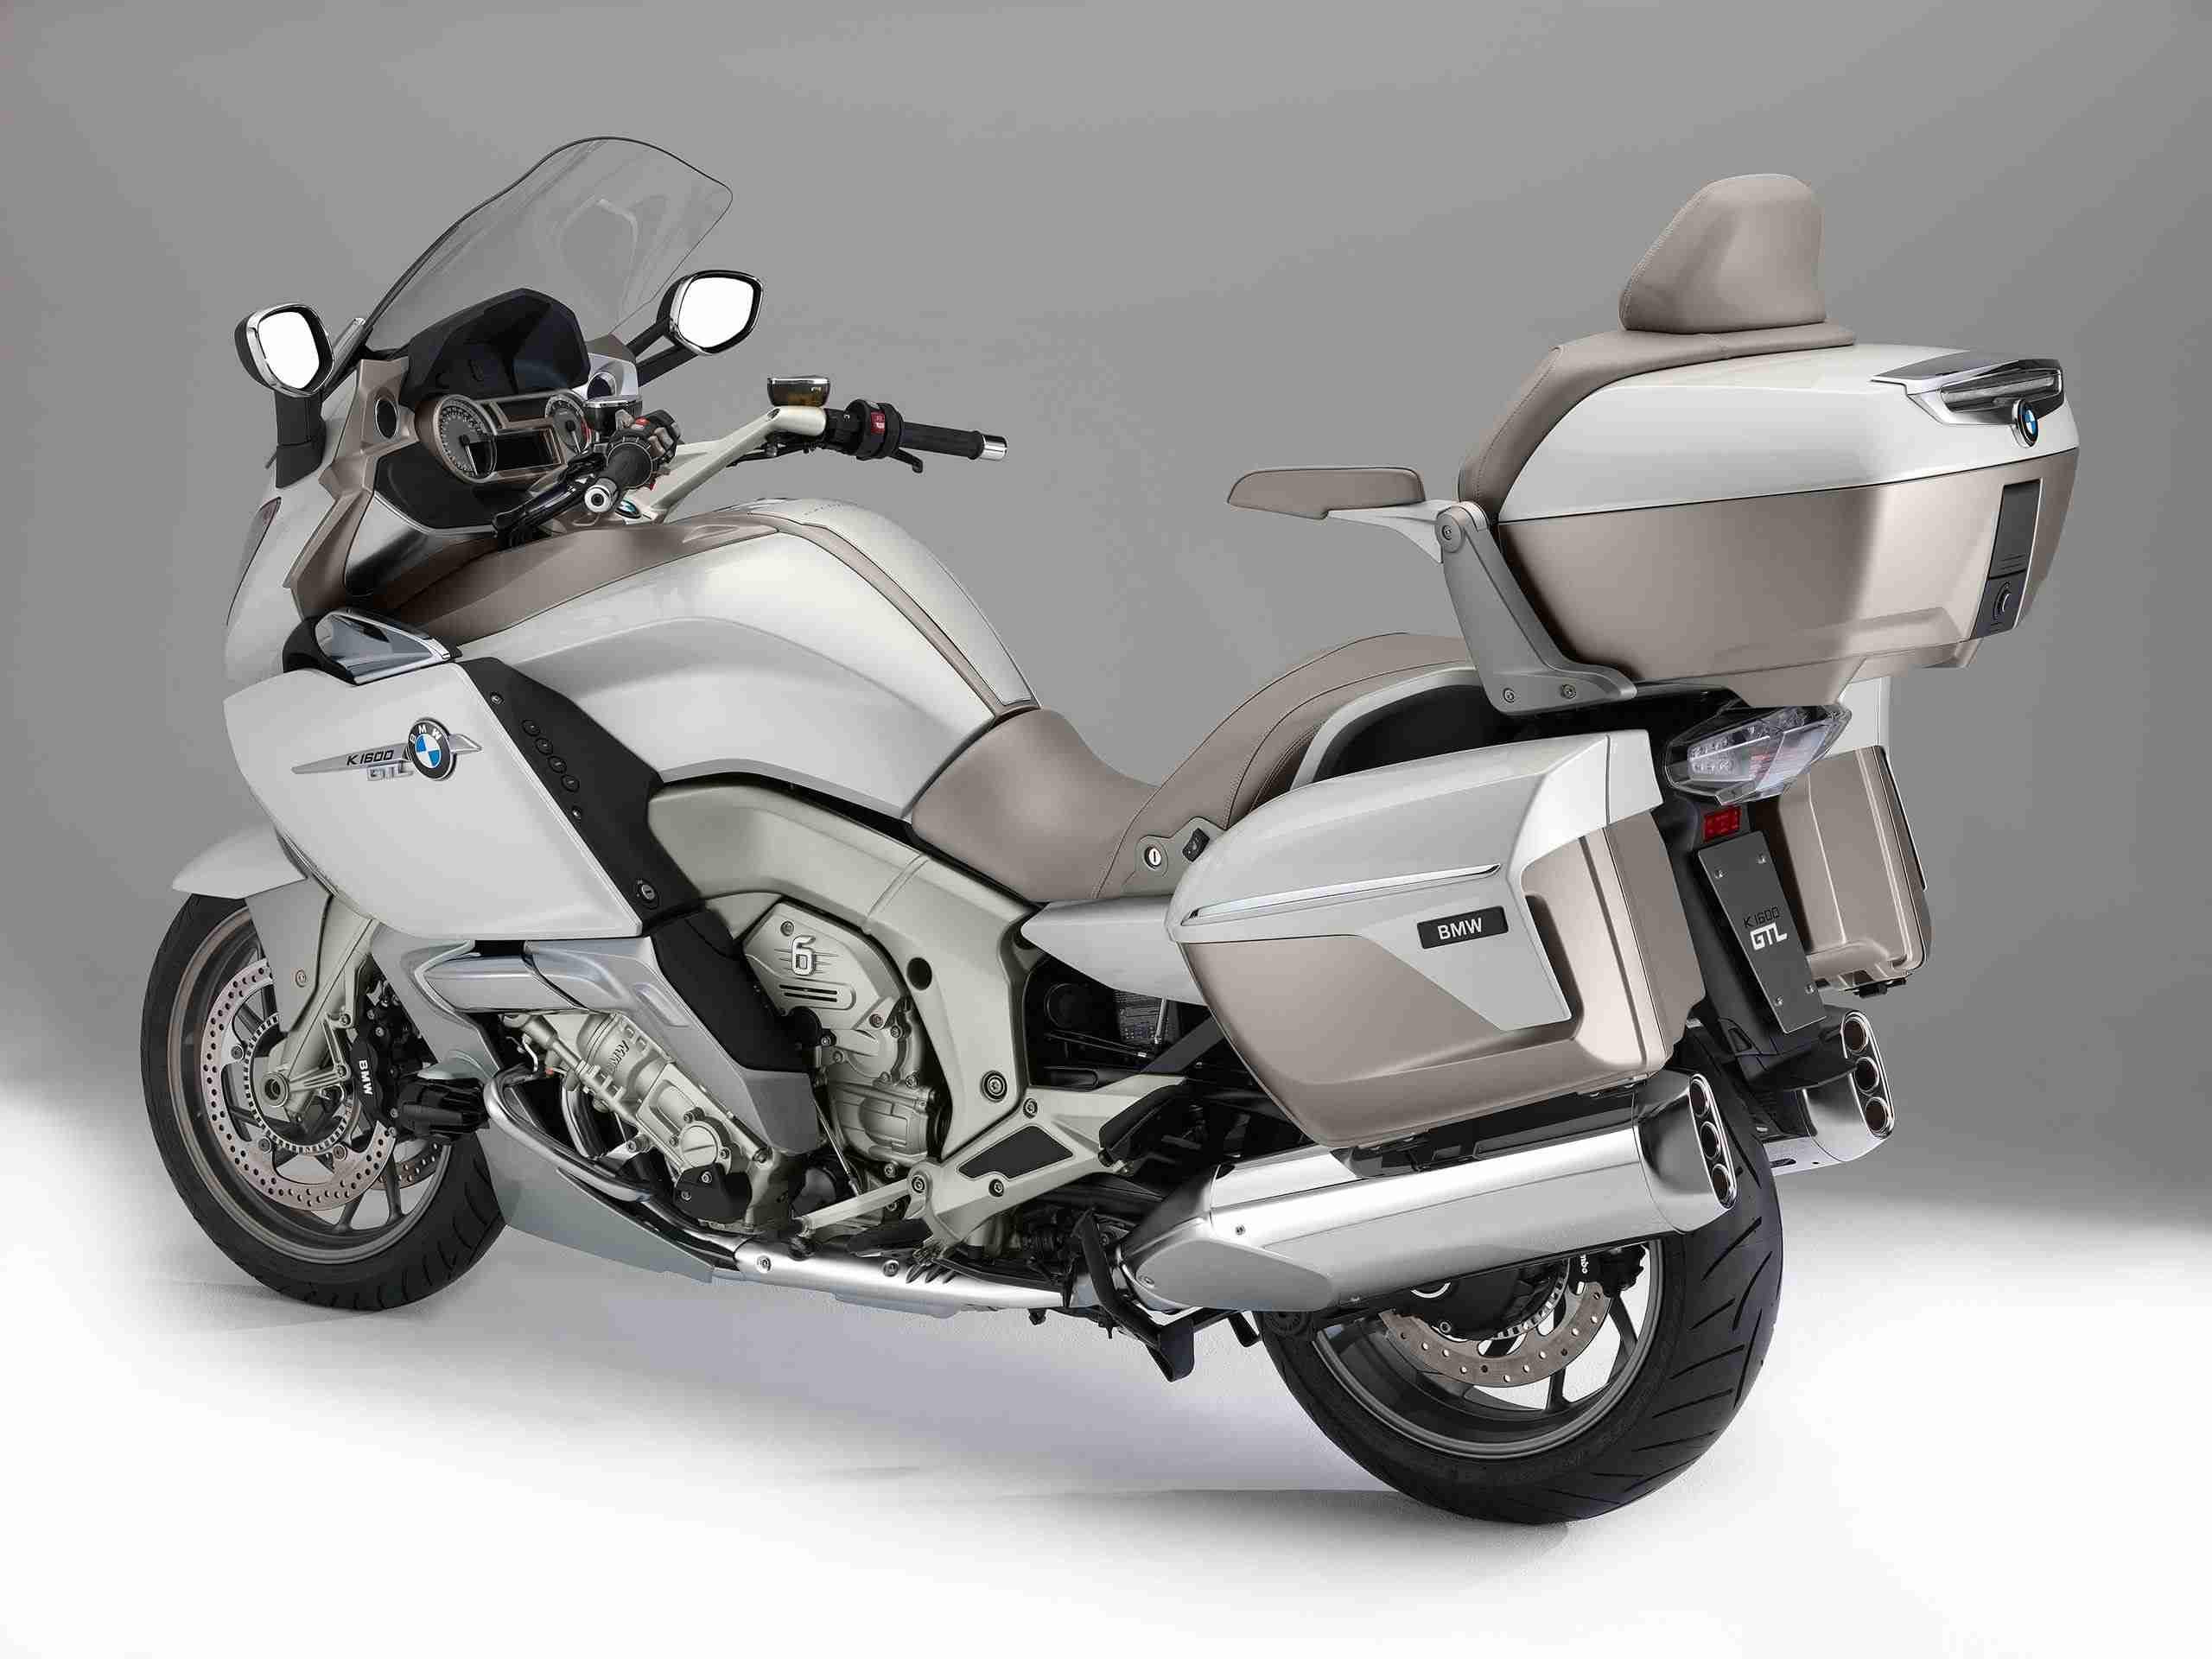 New 2014 BMW K 1600 GTL Exclusive - 04